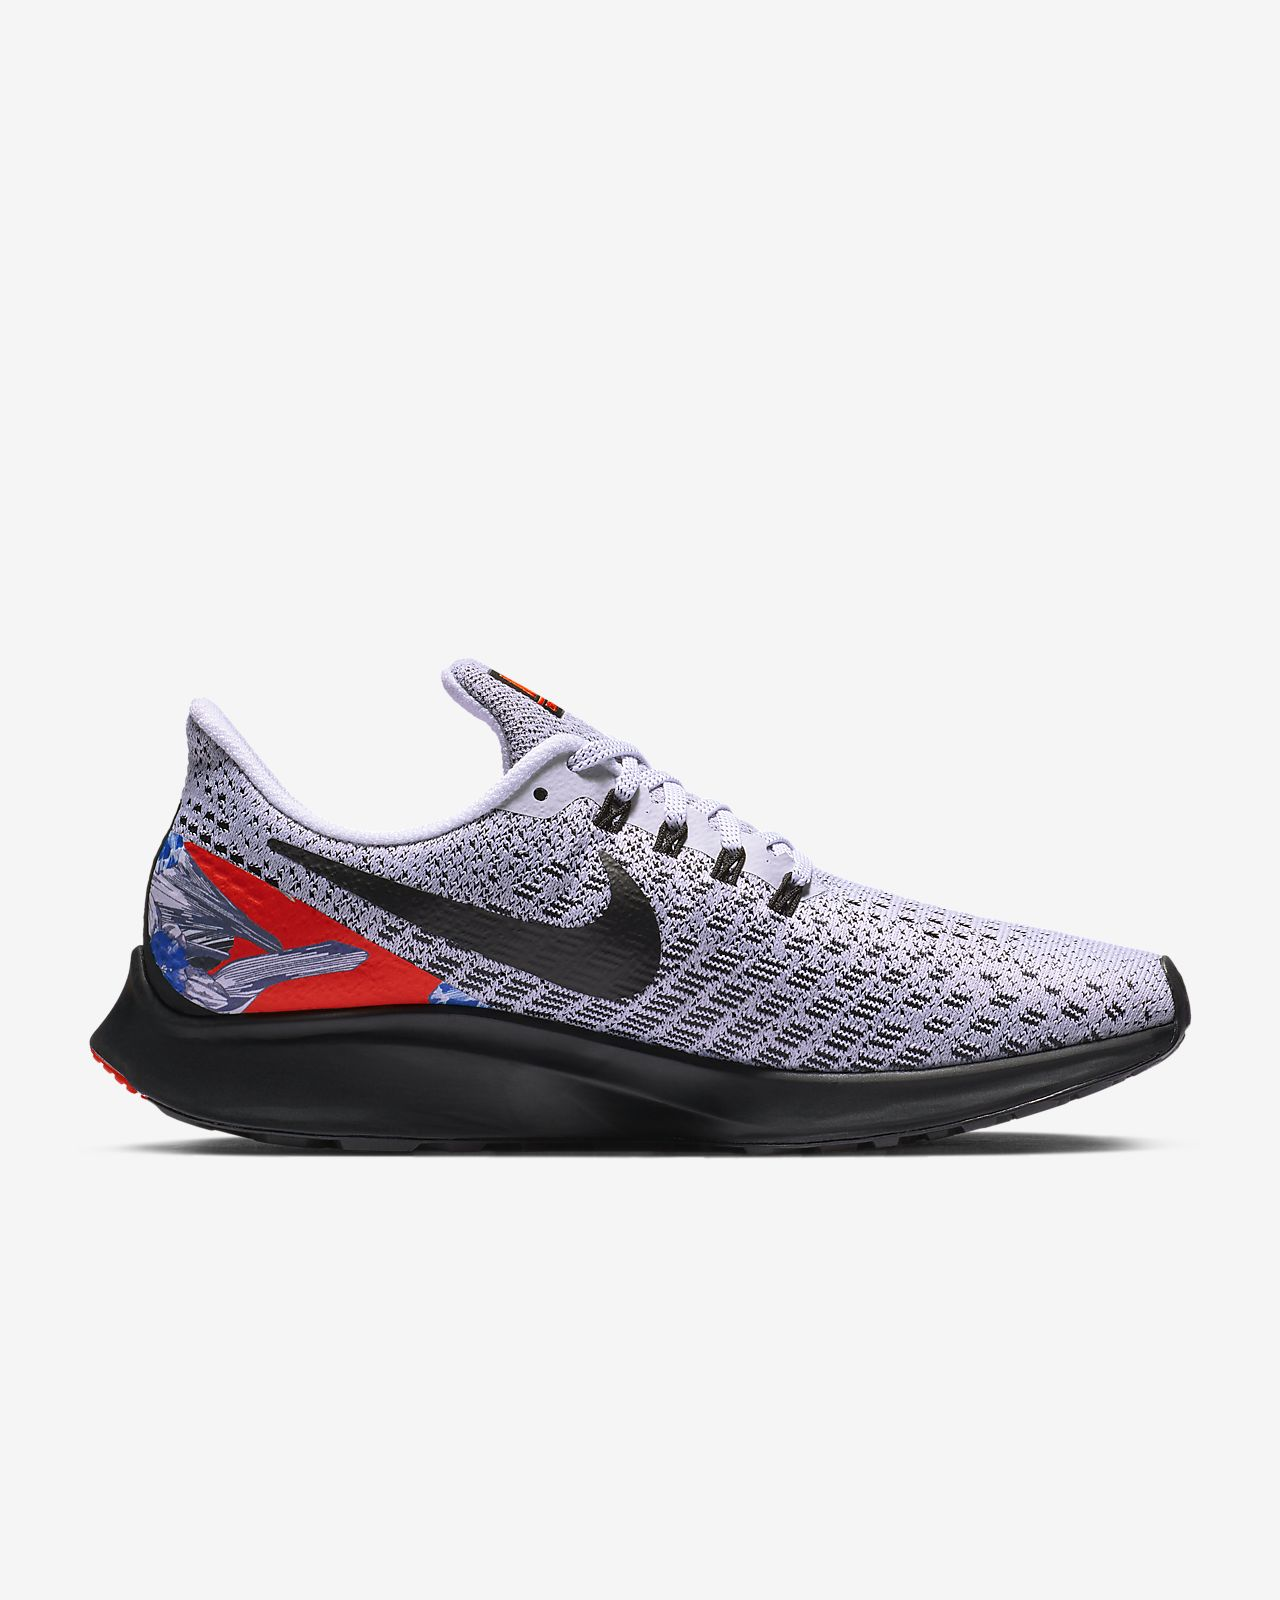 24697f928f3d Nike Air Zoom Pegasus 35 Floral Women s Running Shoe. Nike.com